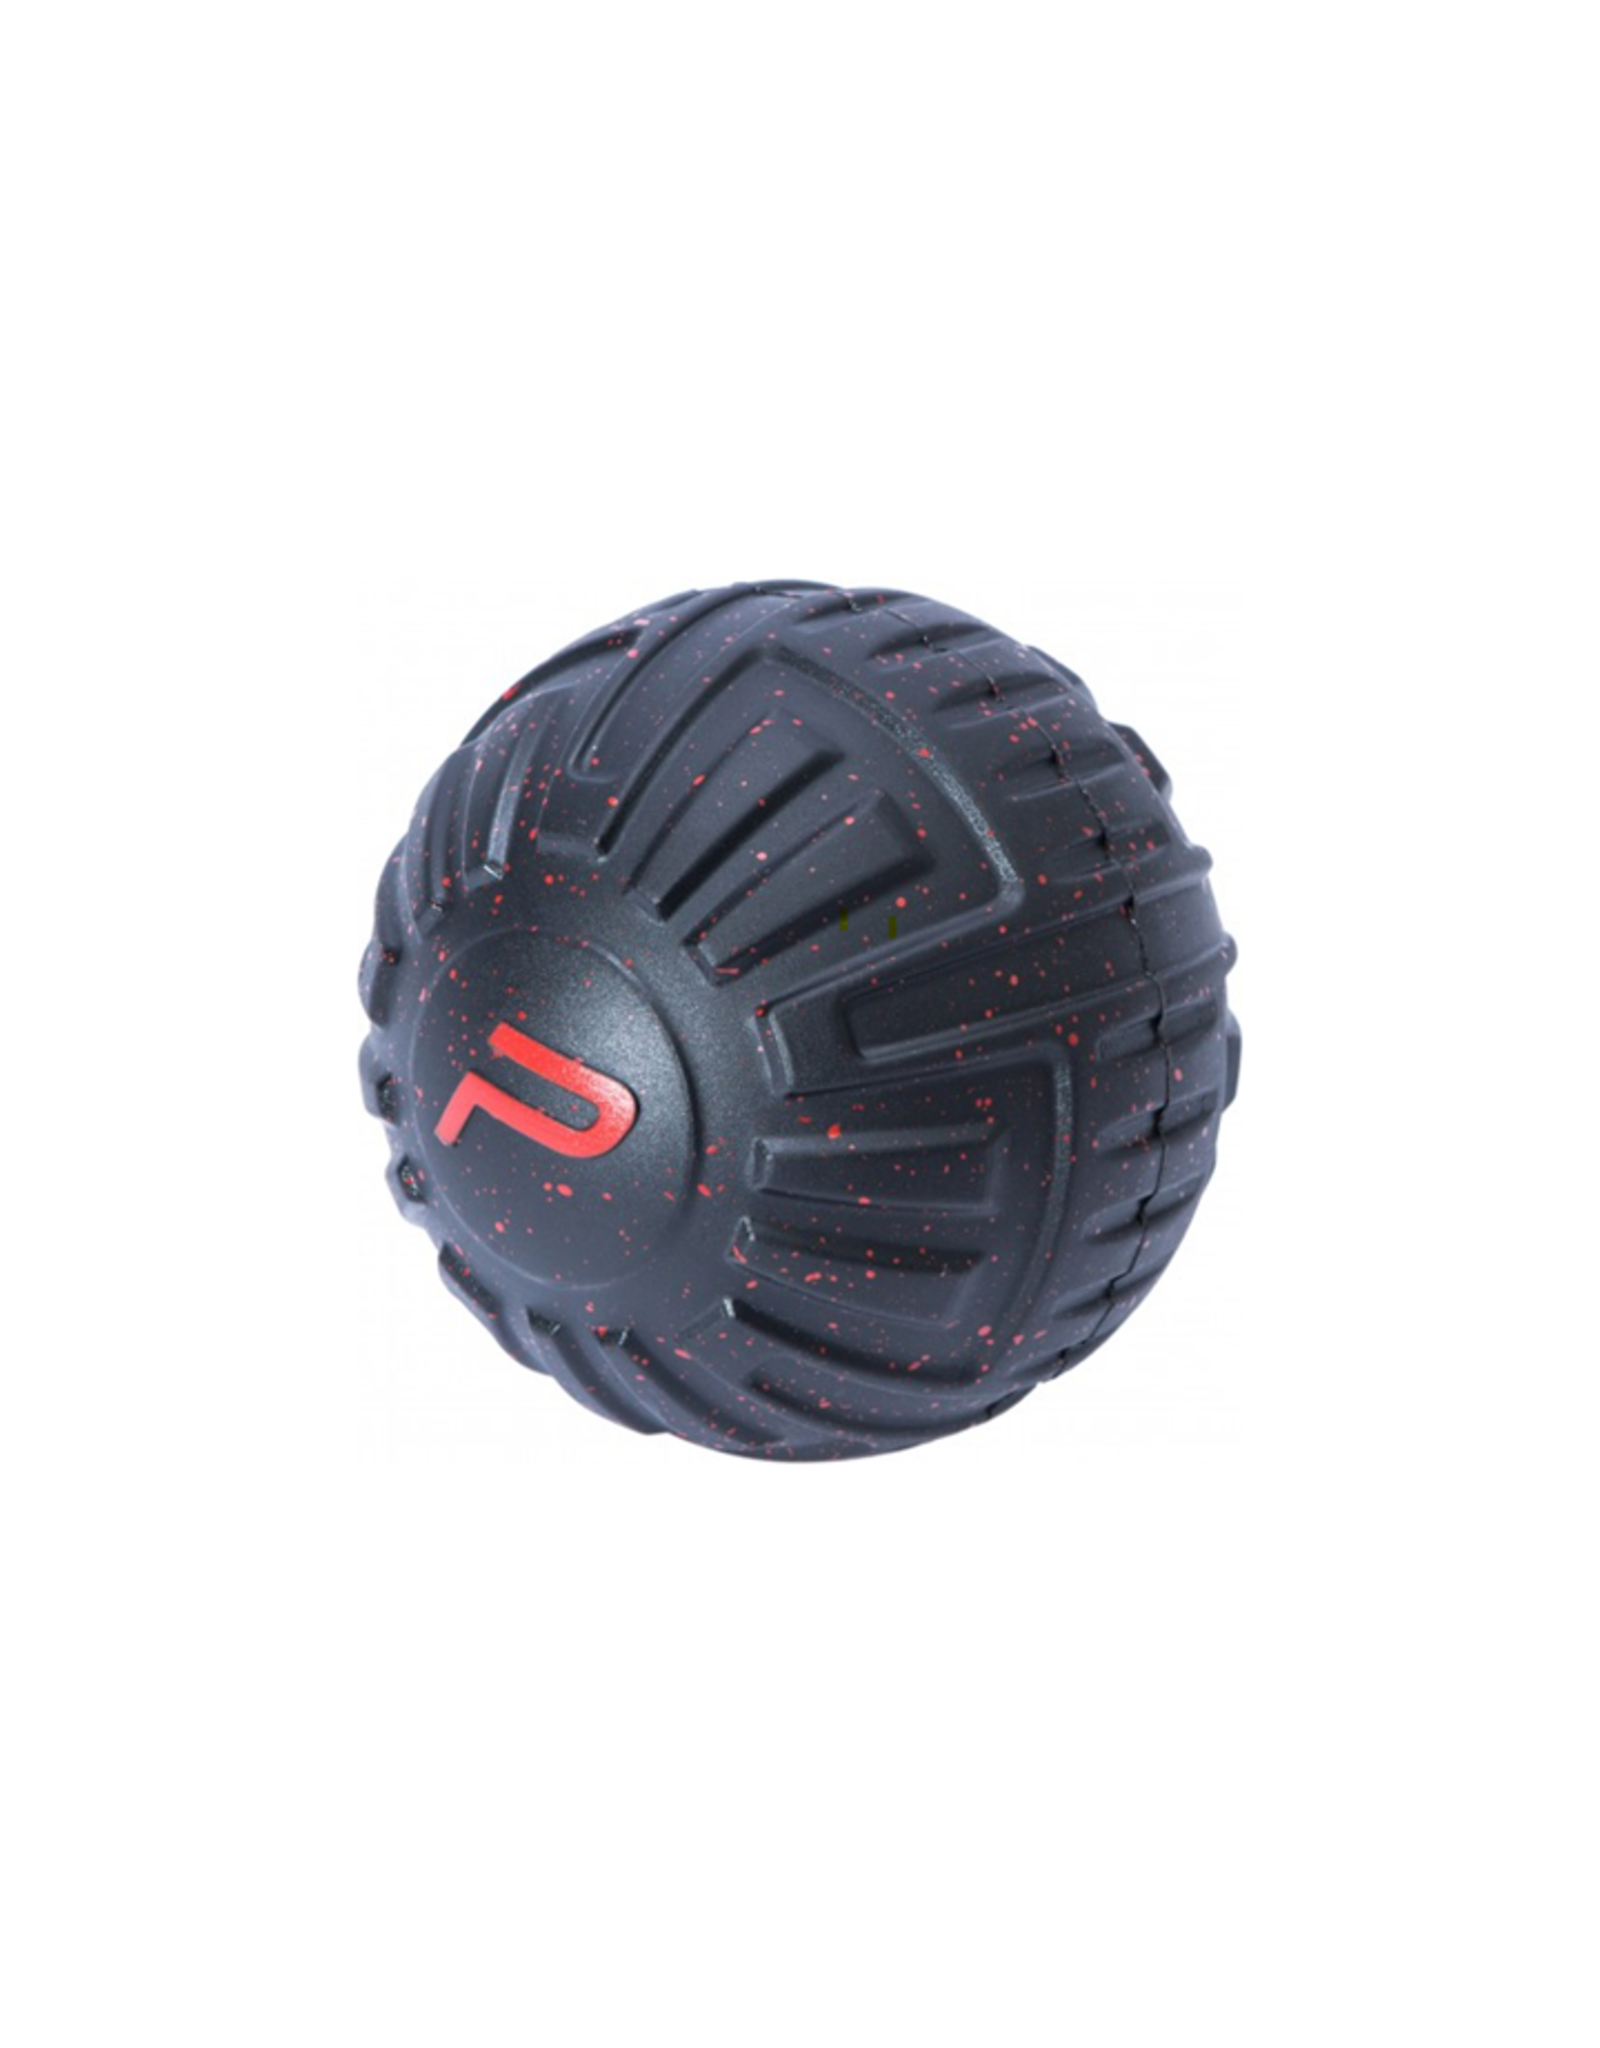 PURE PURE FOOT MASSAGE BALL